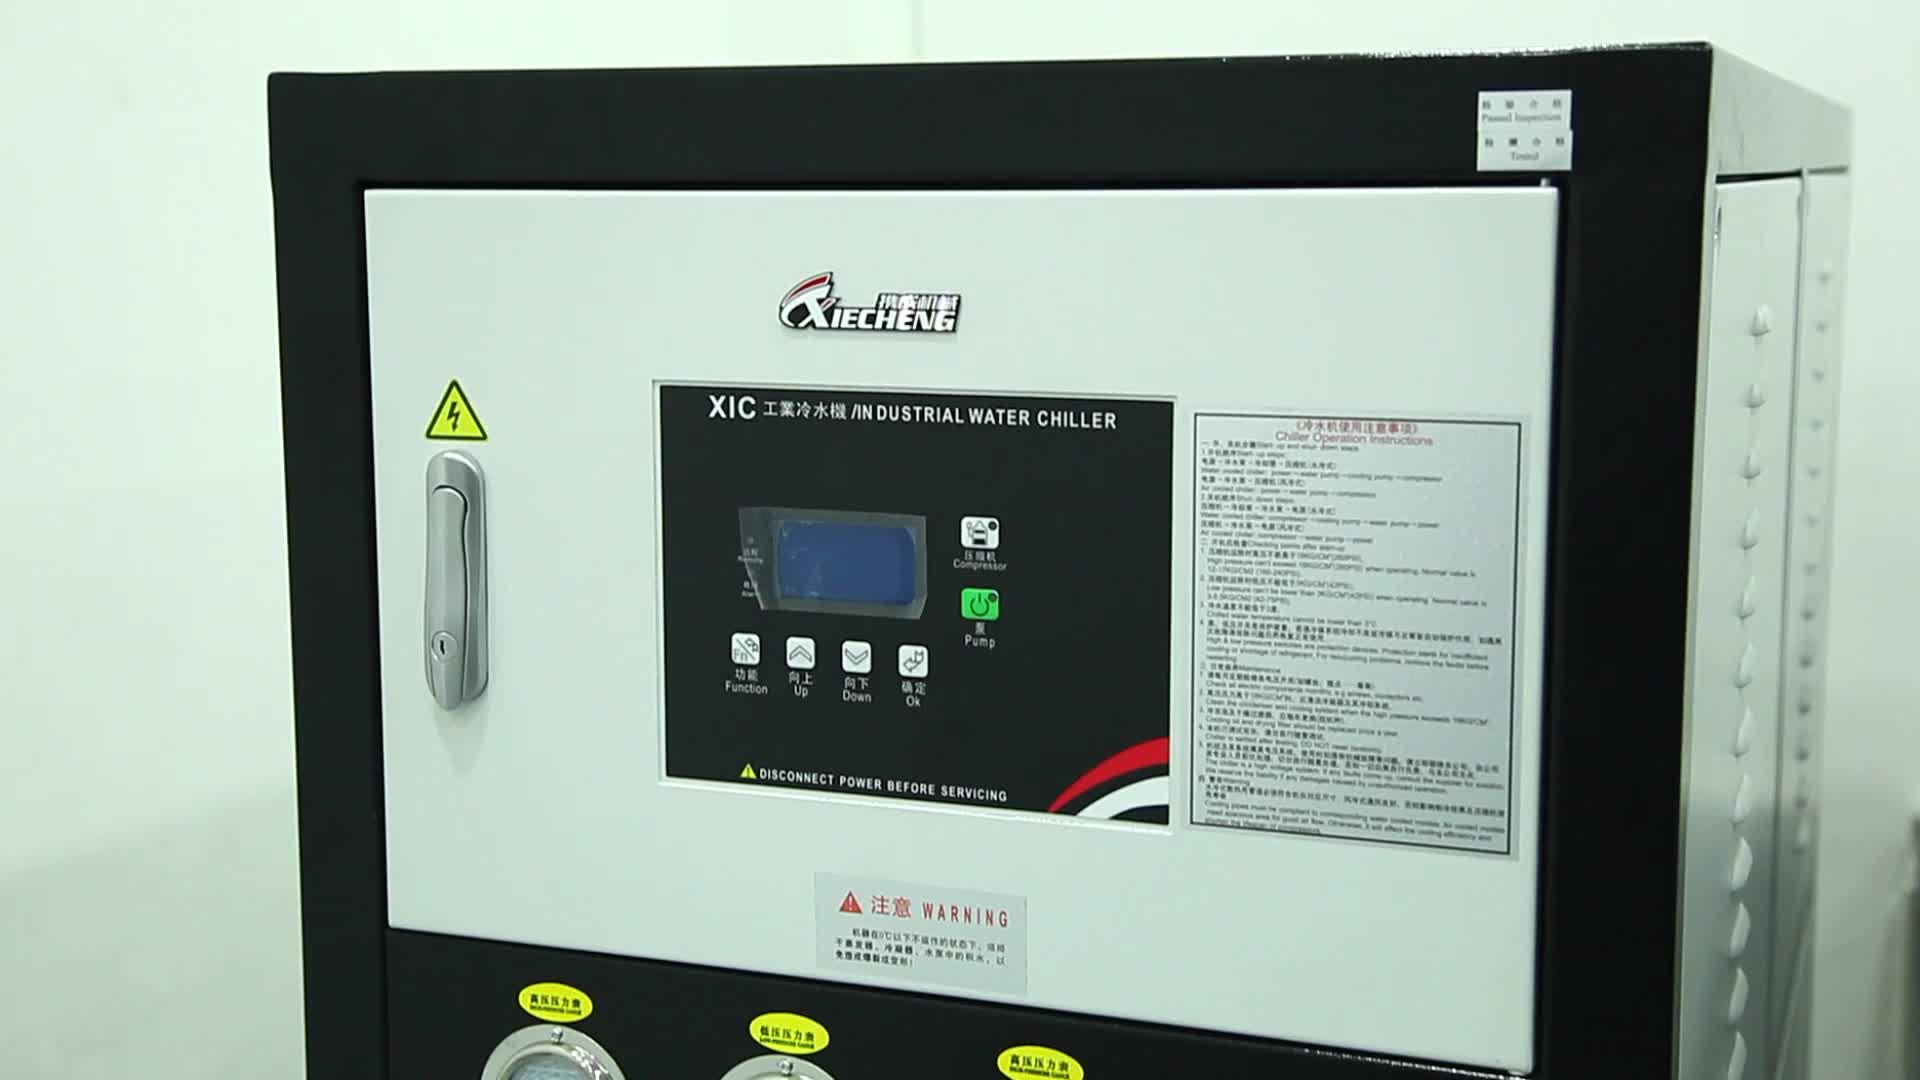 XieCheng มาตรฐาน CE 10HP การแปรรูปพลาสติกอุตสาหกรรมเครื่องทำความเย็นด้วยน้ำเย็น